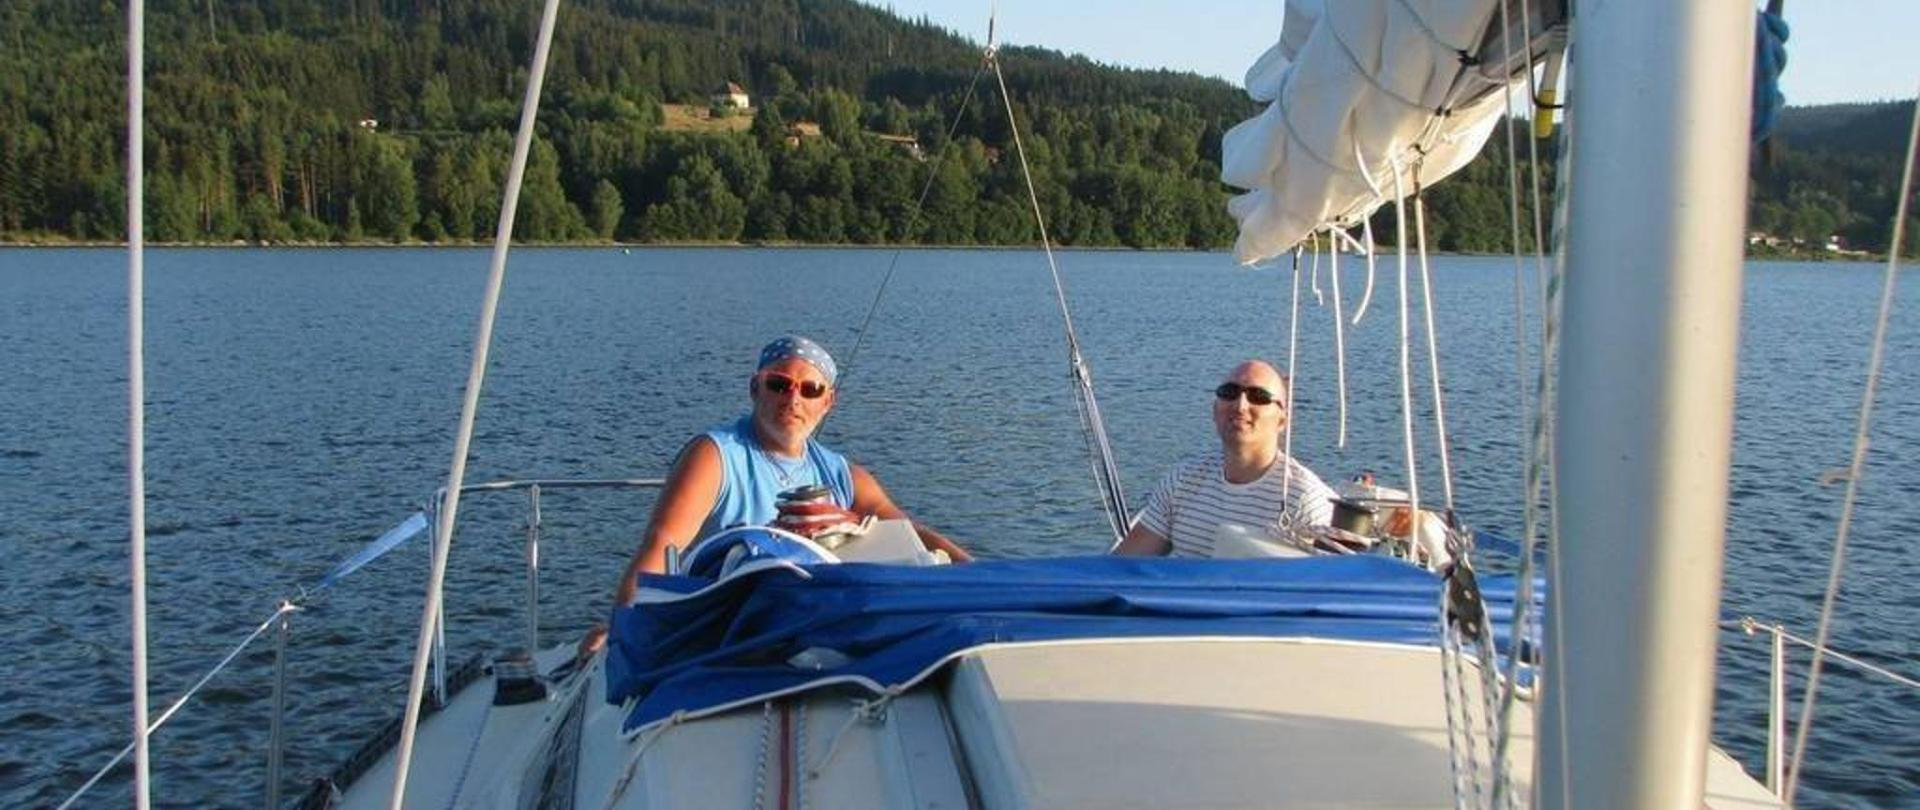 lipno-rd-άσφαλτο-ψάρια-προς-svobodovci-29-8-2015-010-2.jpg